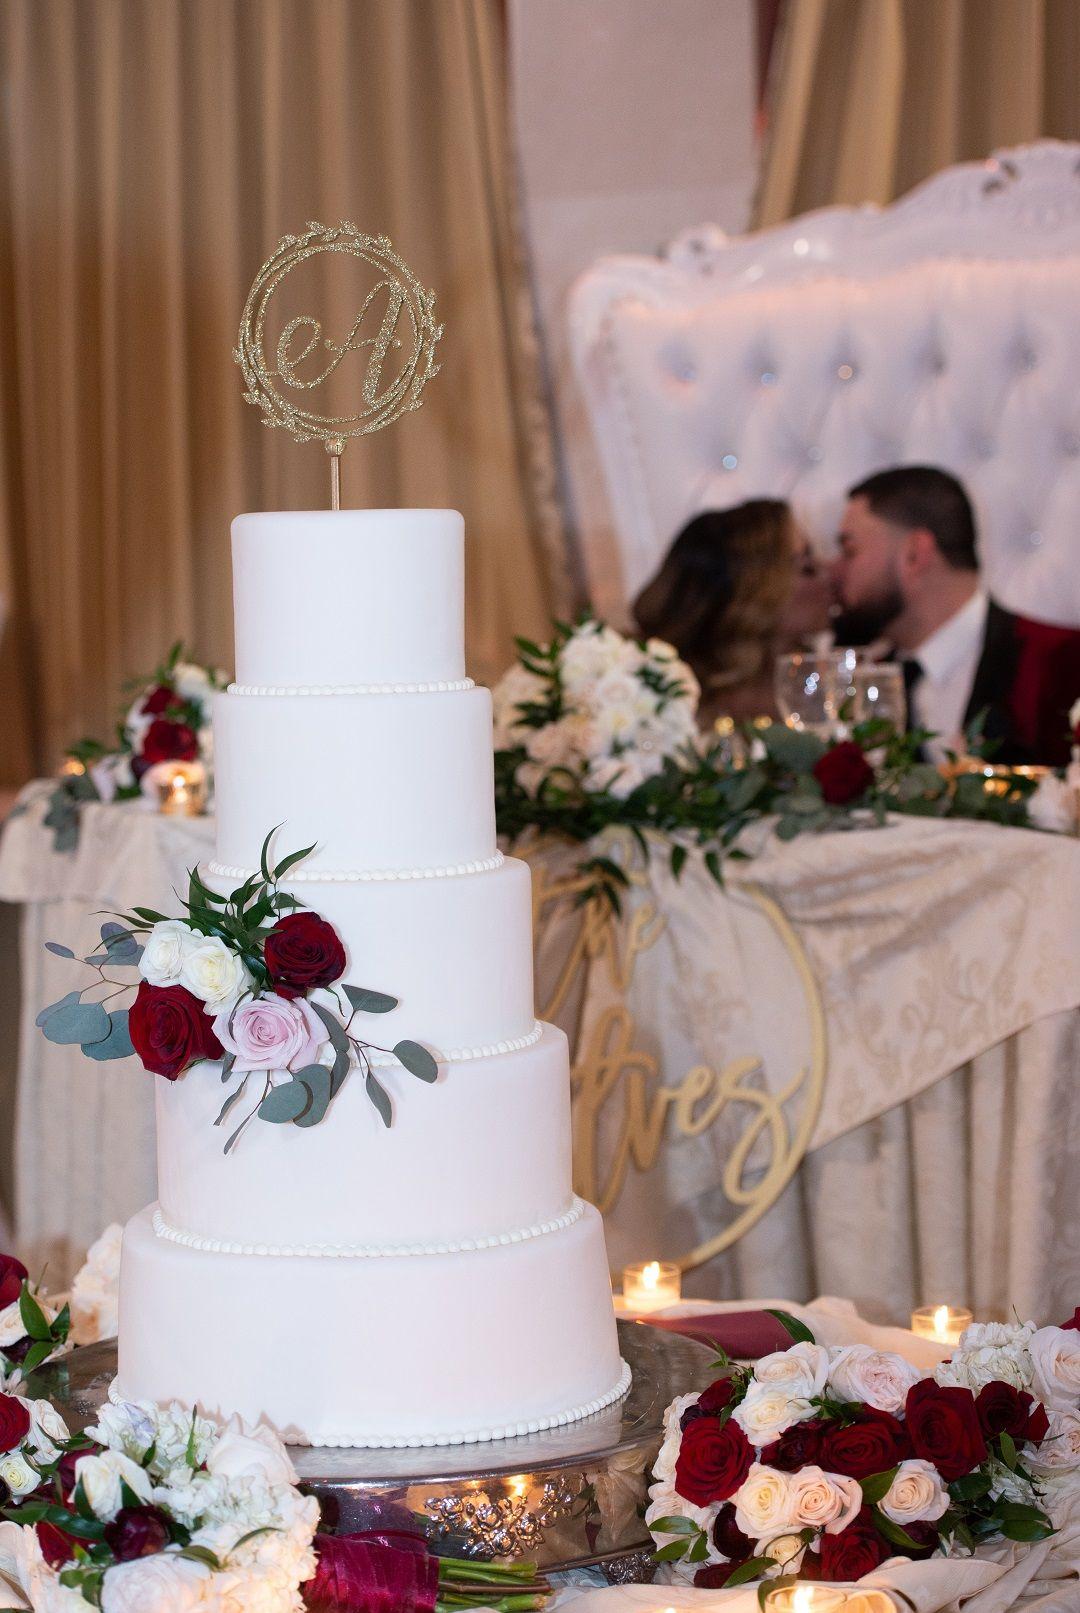 Perfect white fondant wedding cake for NJ wedding in 2020